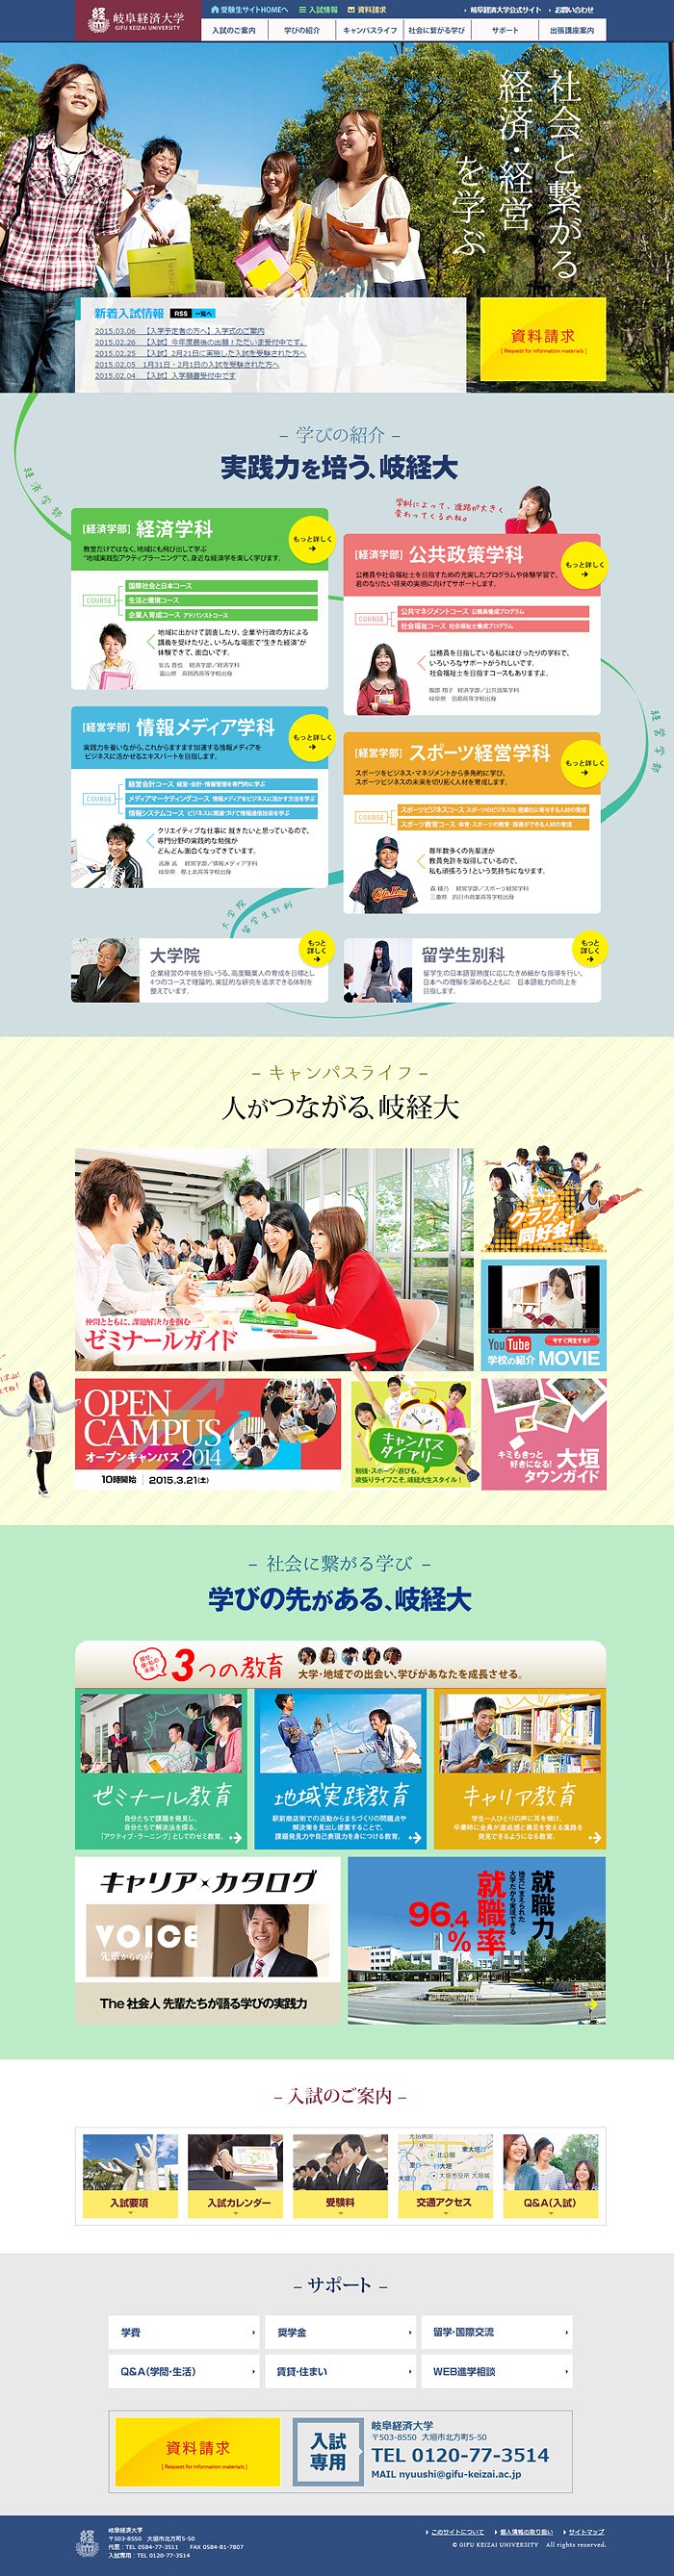 岐阜経済大学受験生サイト